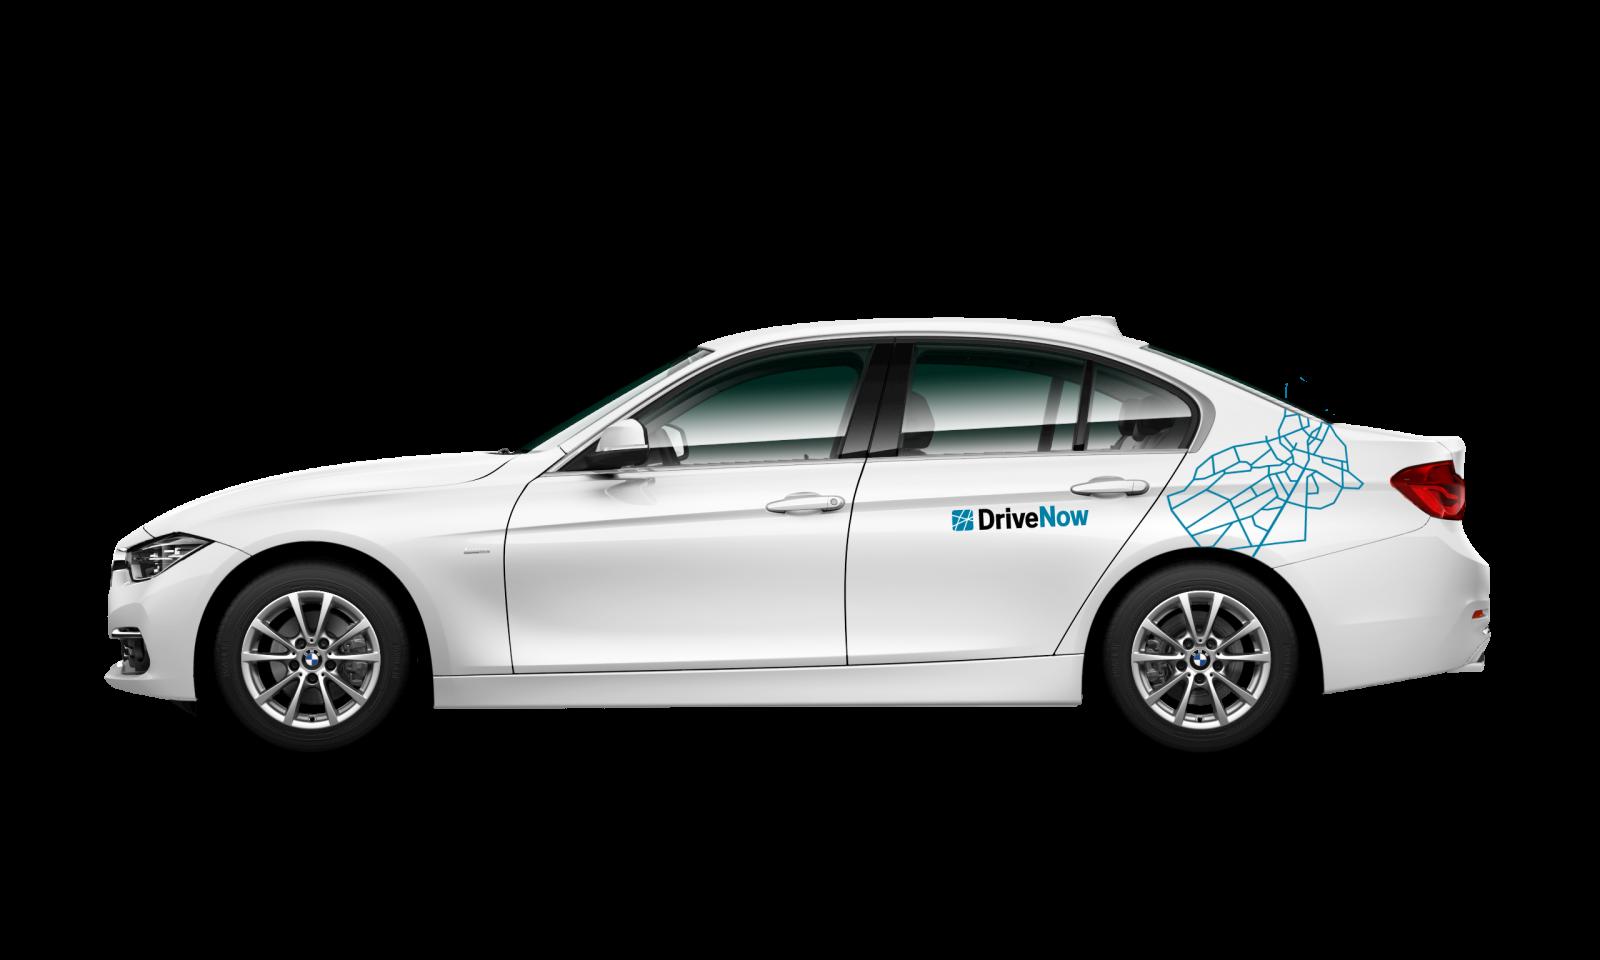 drivenow_bmw_3series_limousine